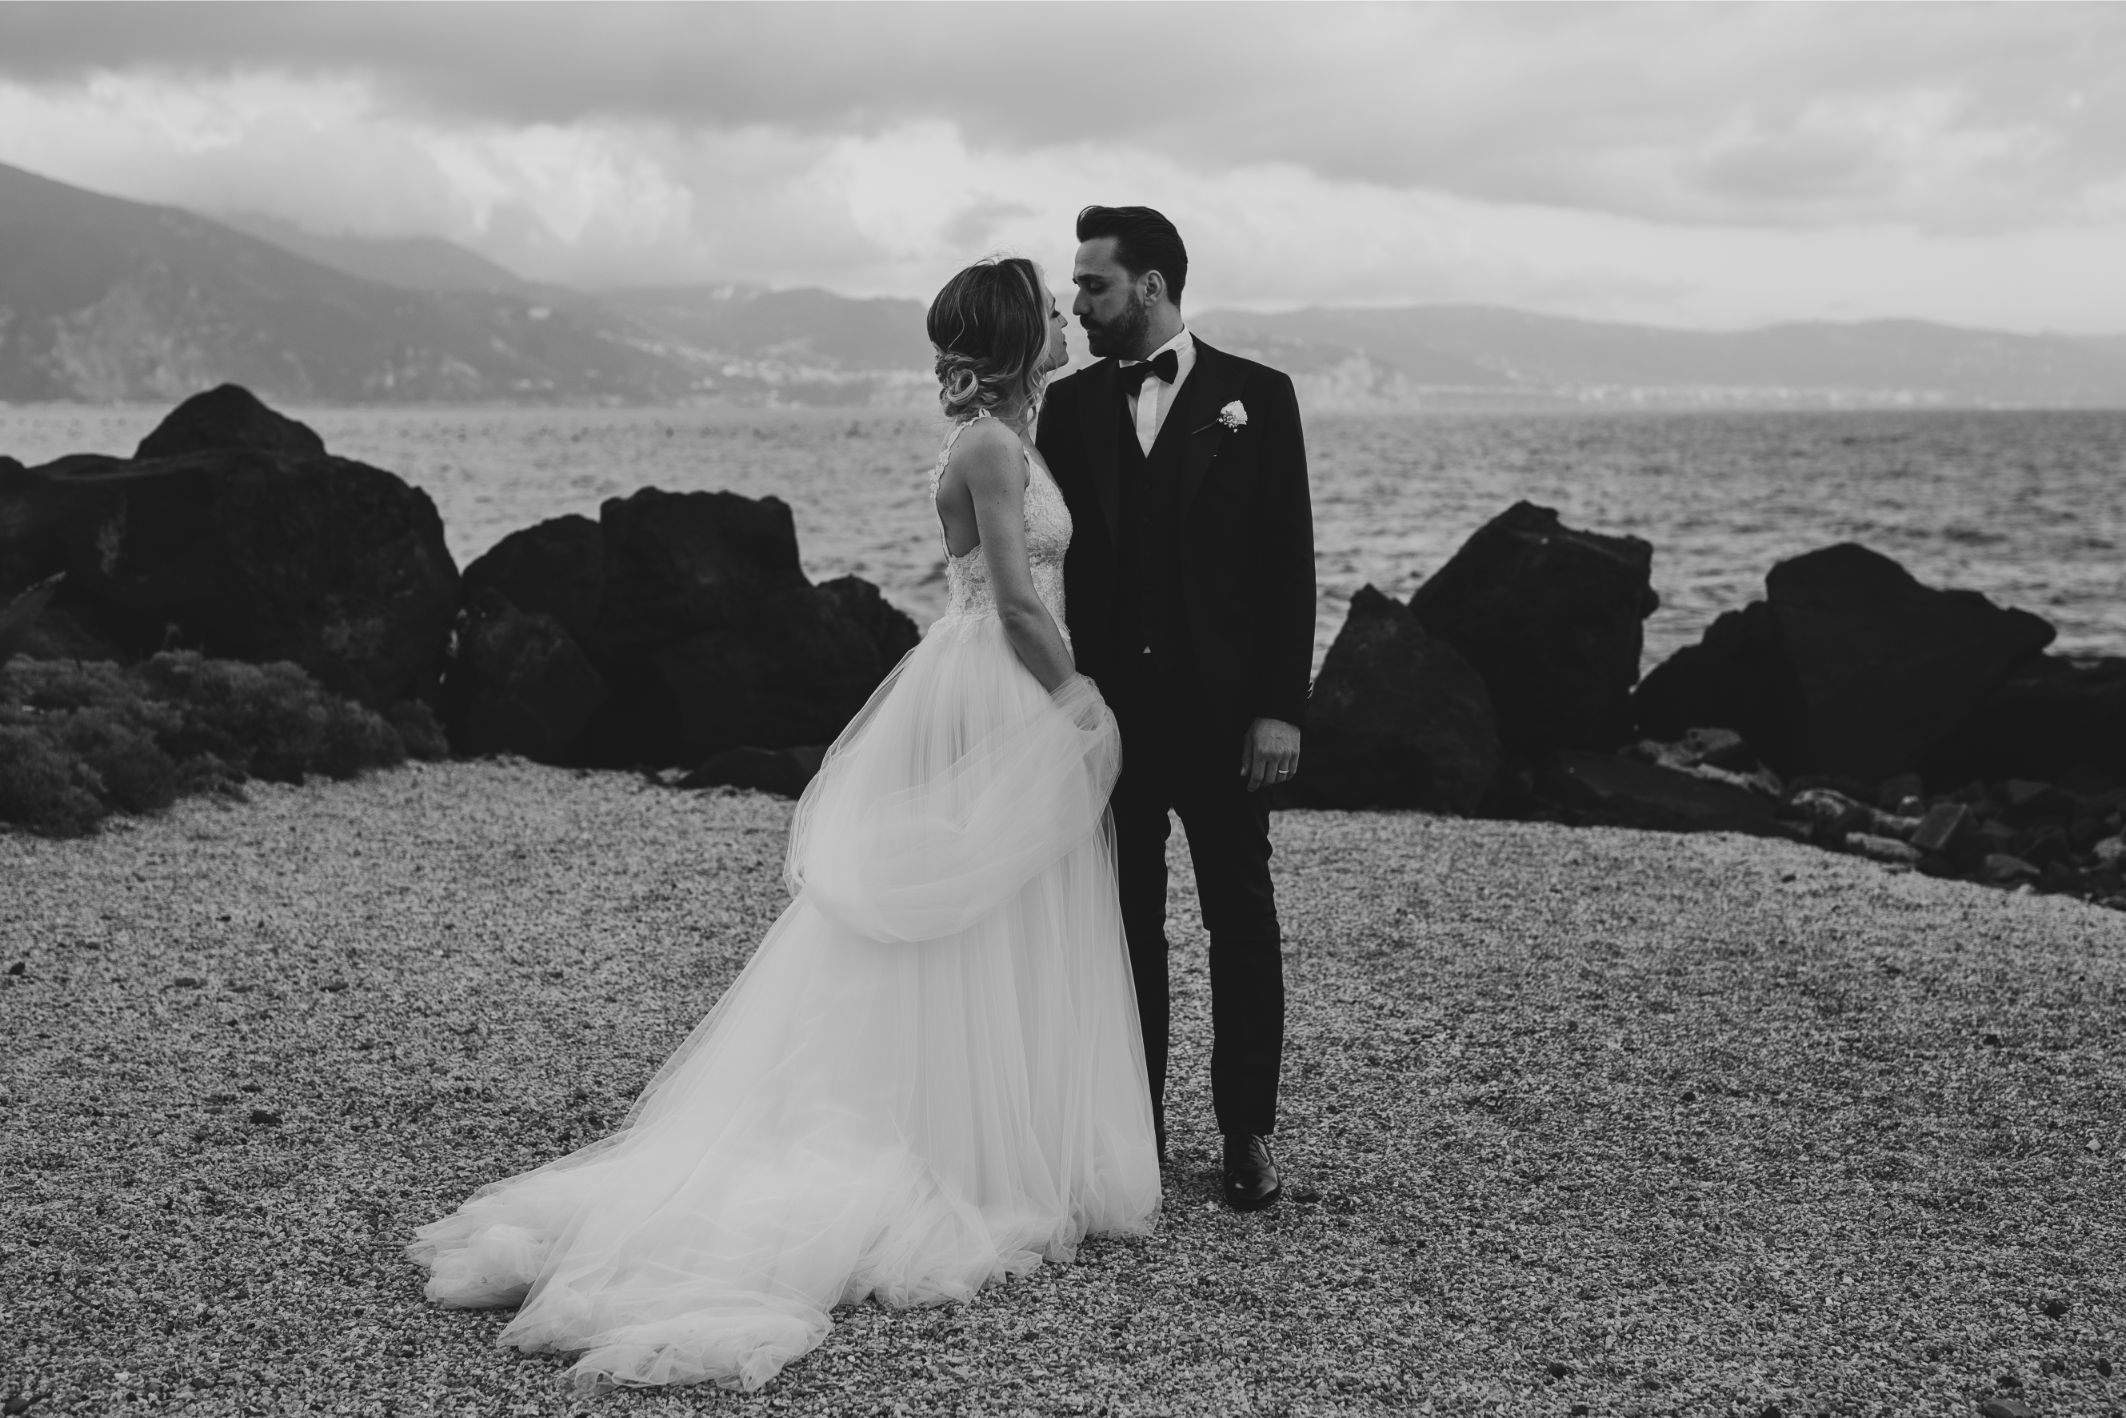 Rhamely | fotografa | matrimoni | Mantova | Lombardia | amalficoast